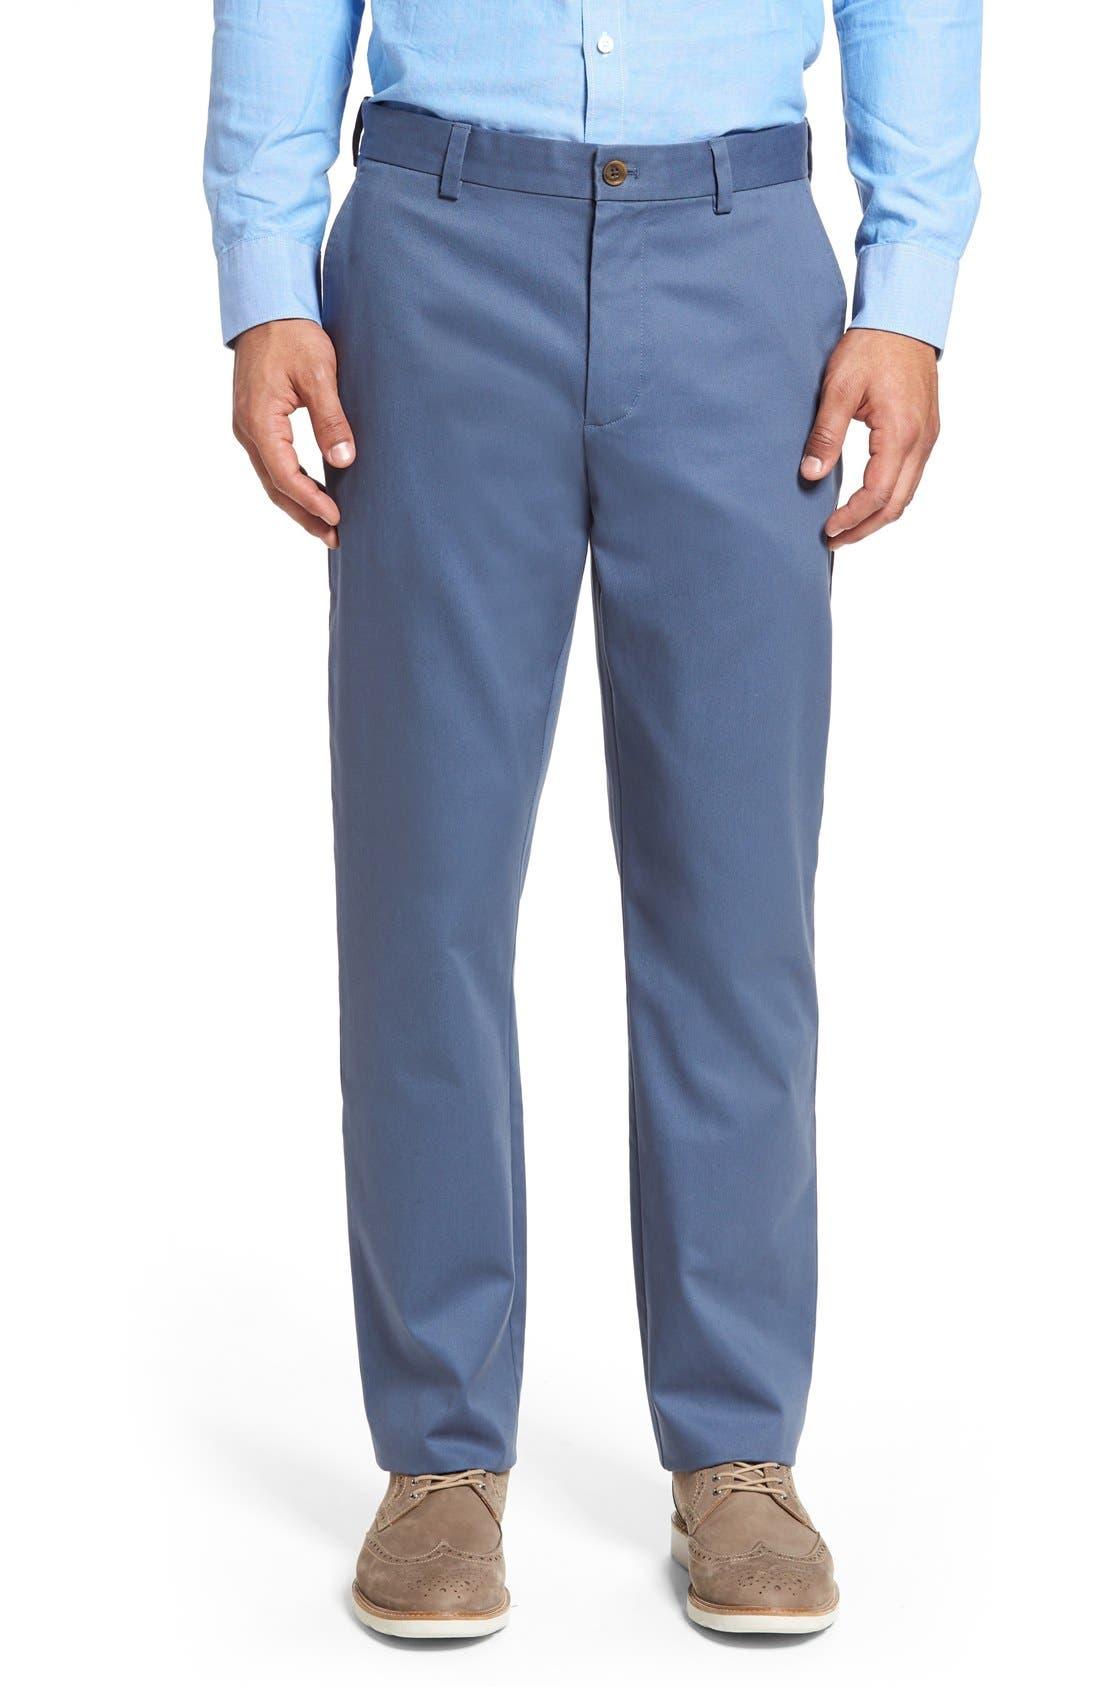 Main Image - Nordstrom Men's Shop Wrinkle Free Straight Leg Chinos